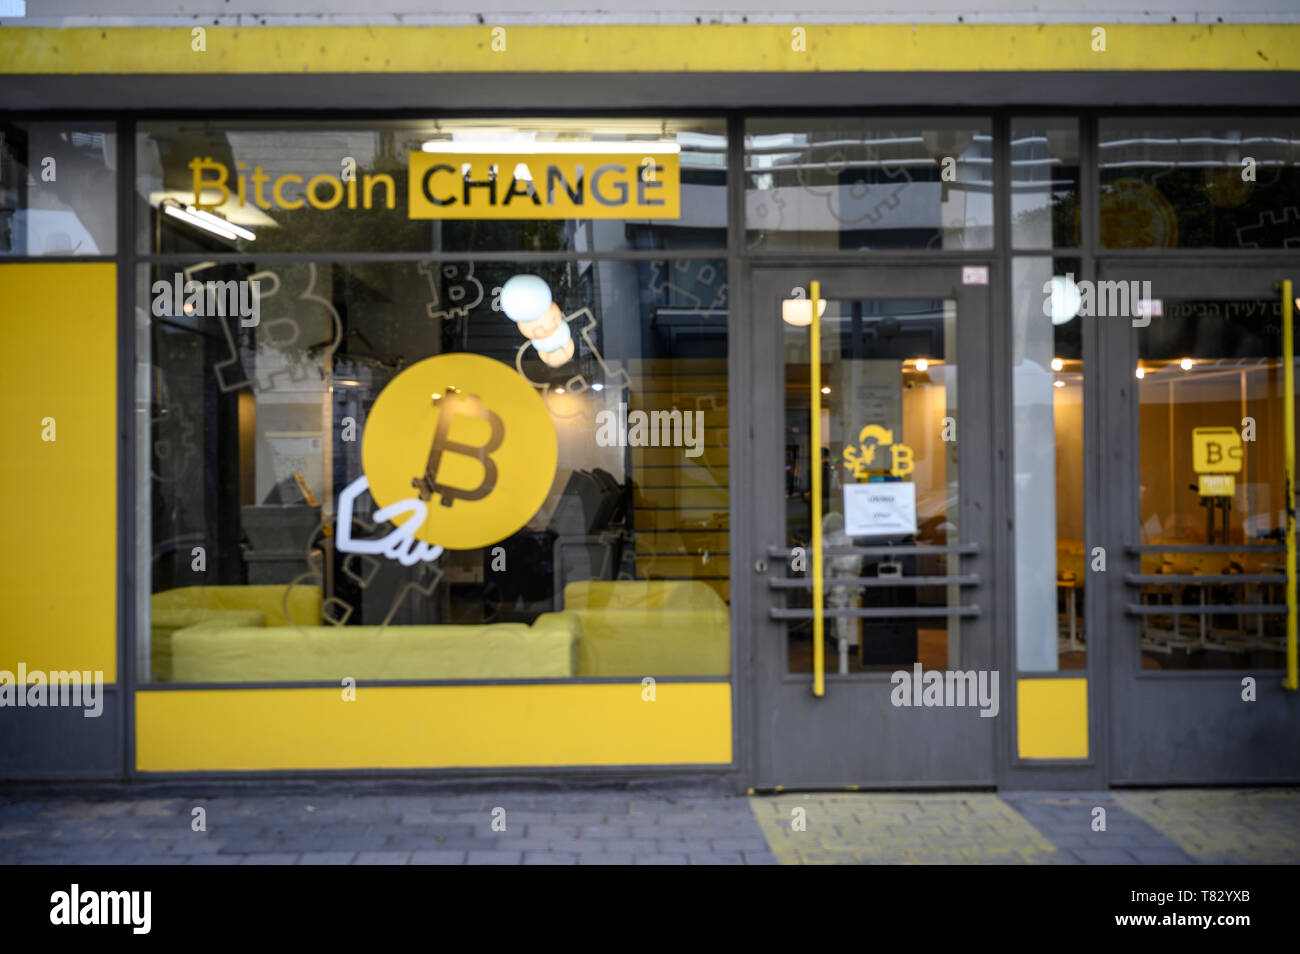 Bitcoinshop how long are winning betting slips valid